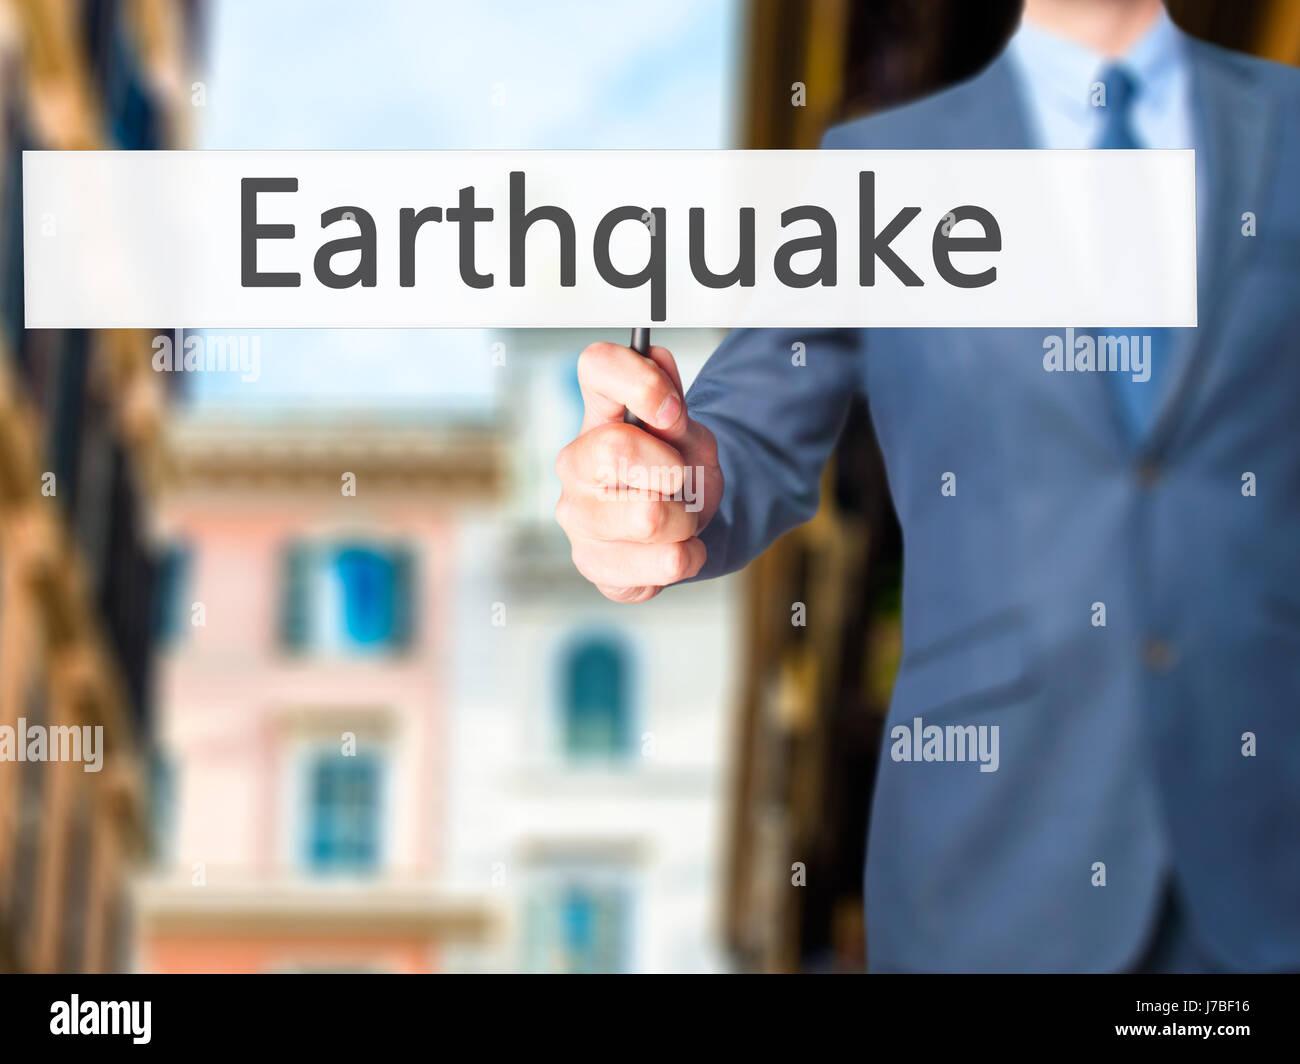 Technology Management Image: Hand Tremor Stock Photos & Hand Tremor Stock Images